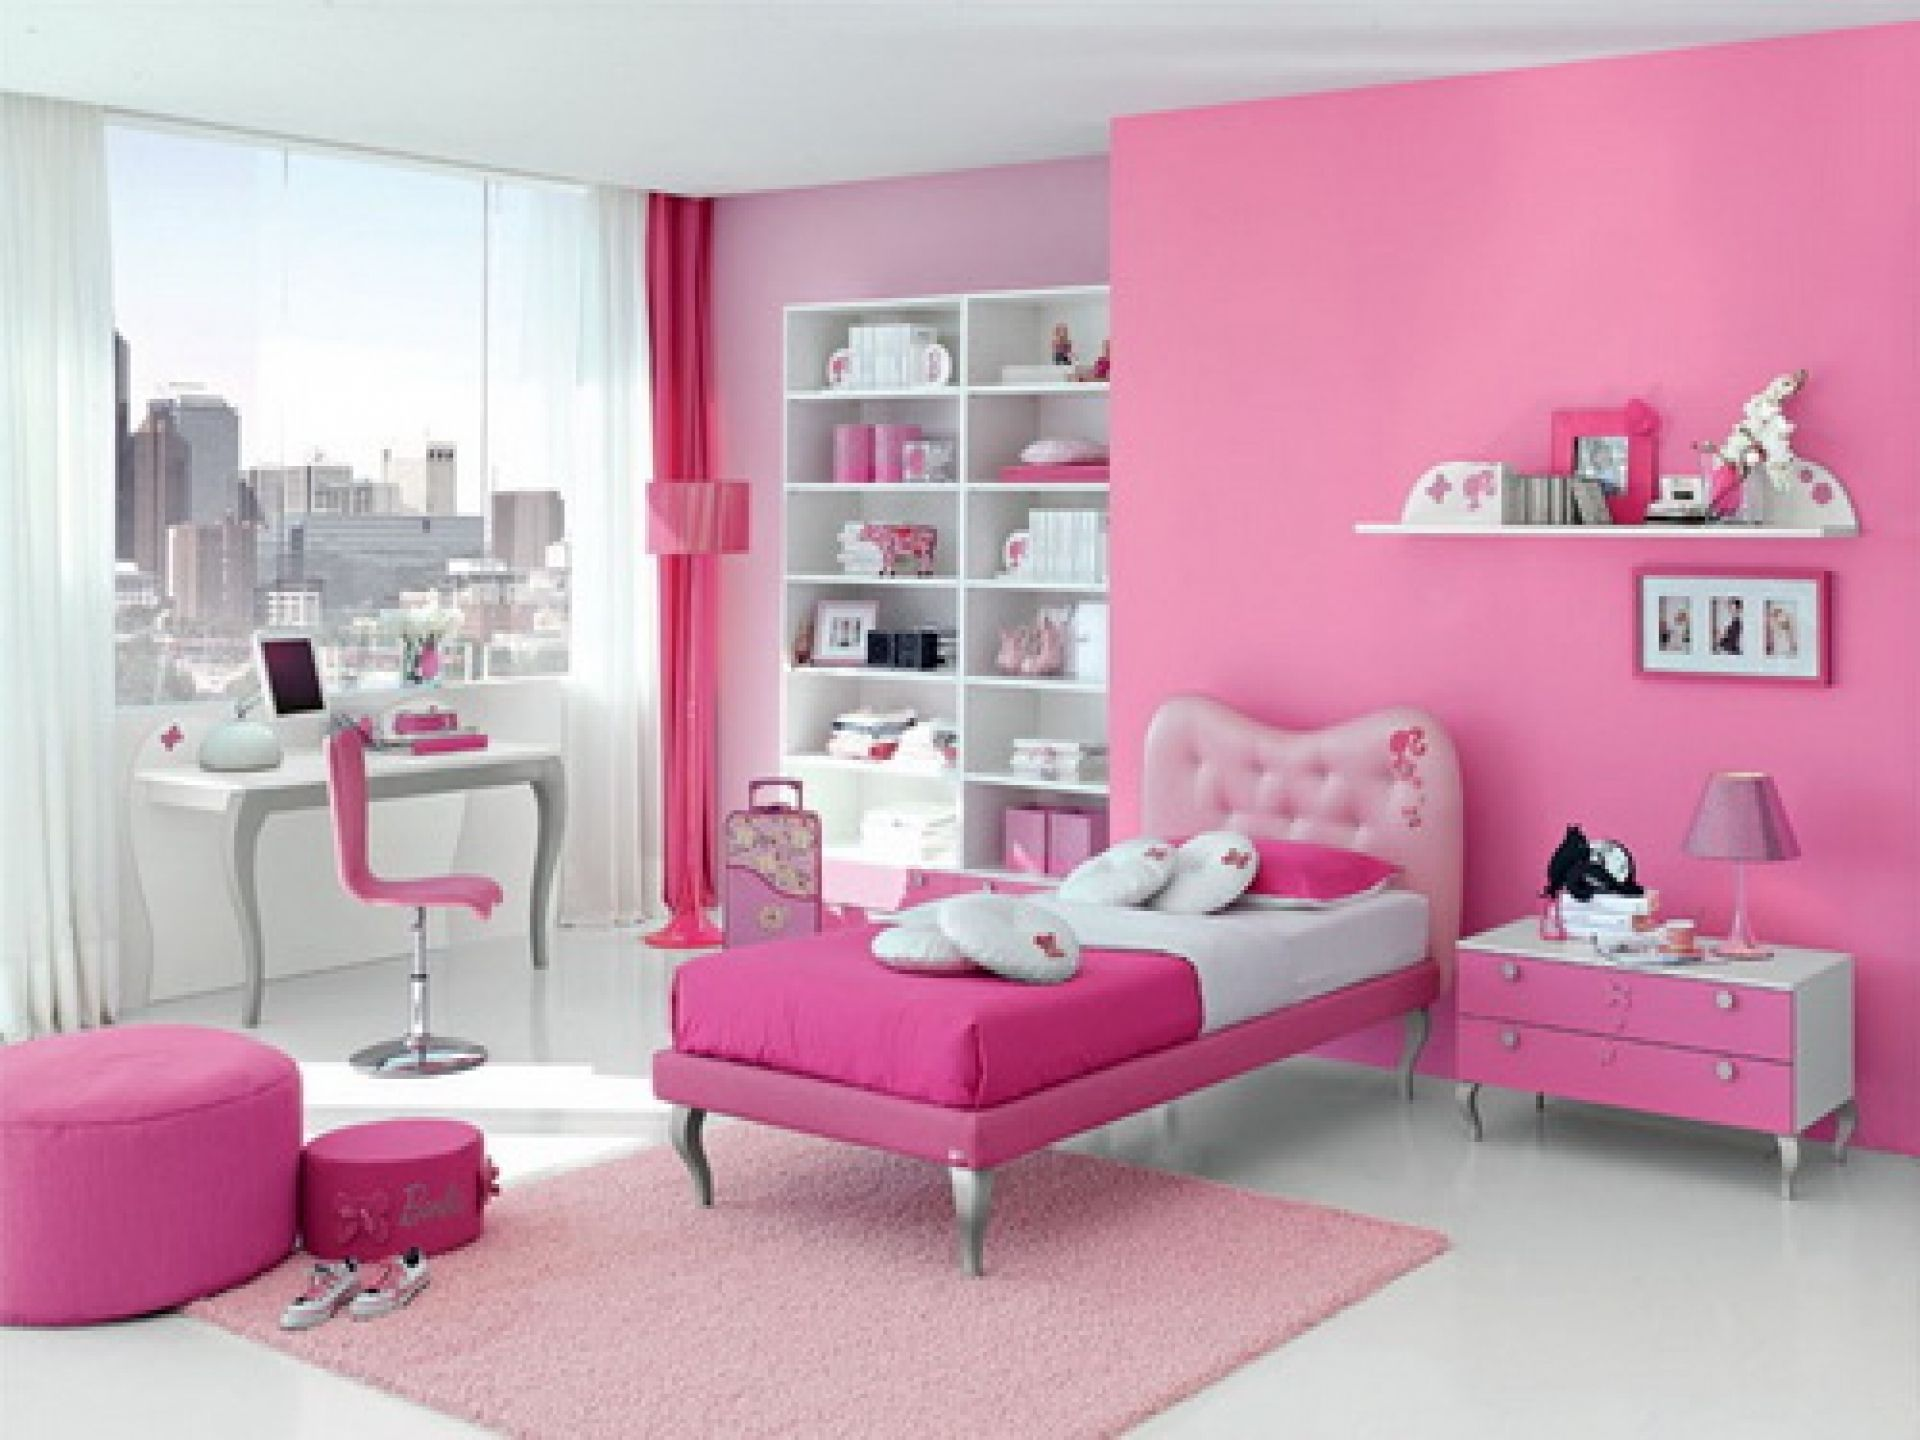 Schlafzimmer Pink ~ Best schlafzimmer images bedroom amish